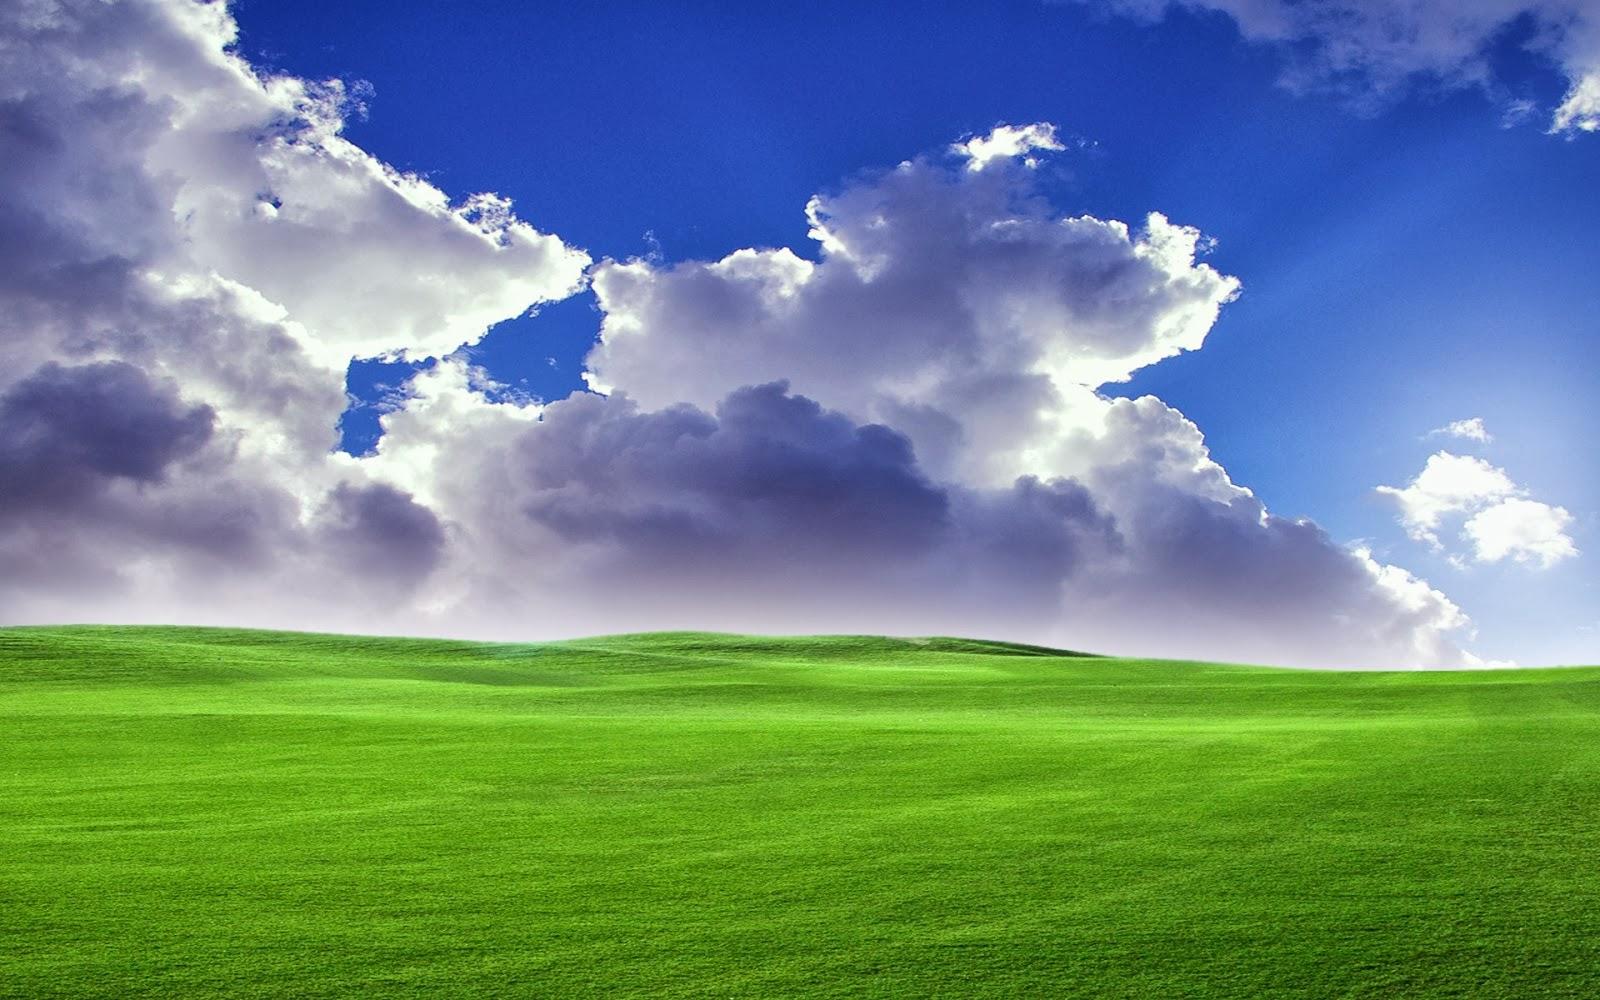 Bajar fondos de pantallas e imagenes fondo de pantalla for Bajar fondos de pantalla hd